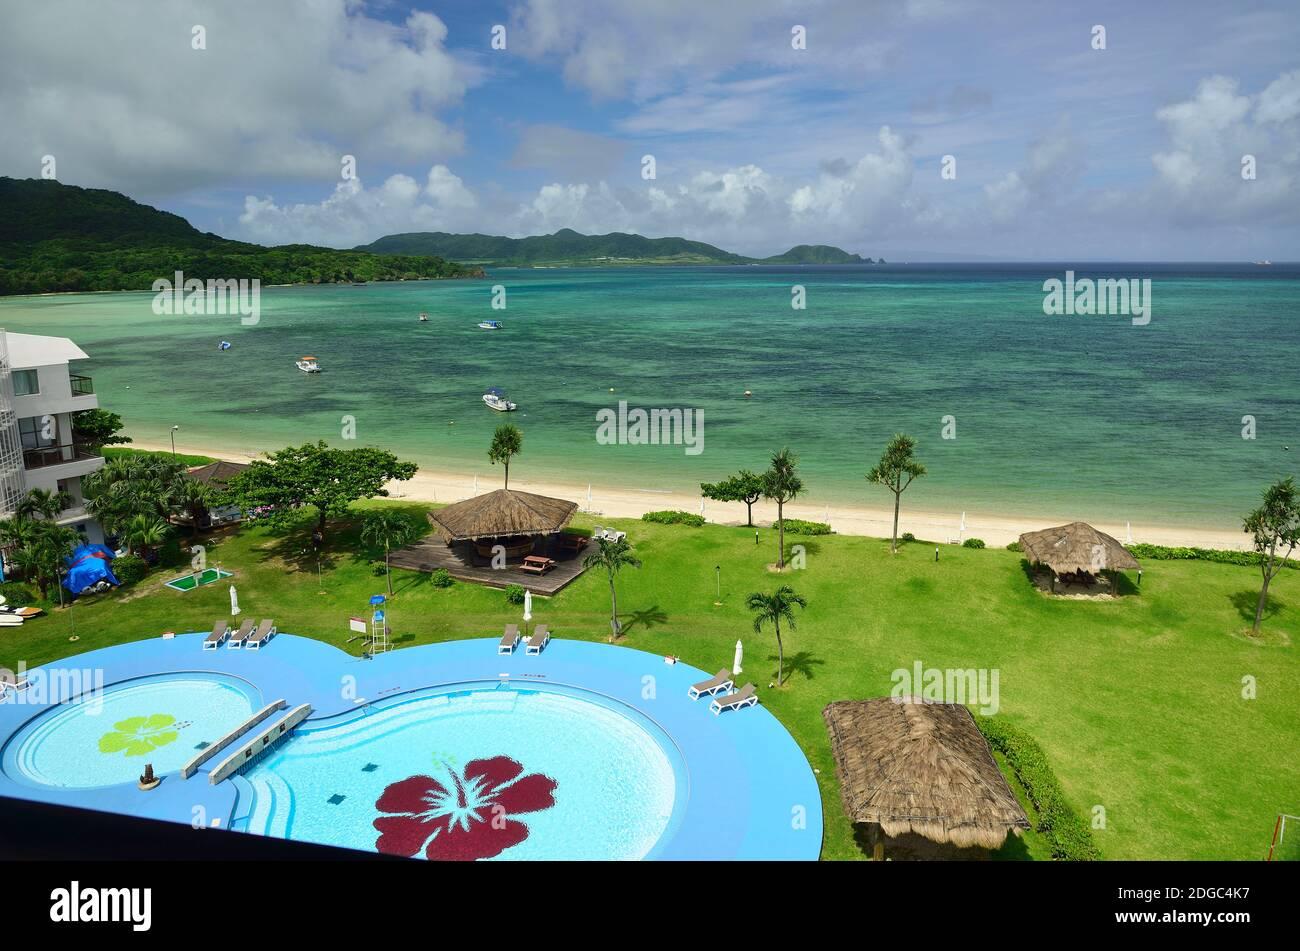 Ishigaki Seaside Hotel, Swimming Pool, In the Rain, Kabira, Ishigaki, Yahema Islands, Okinawa, Ryukyu Islands, Japan Stock Photo